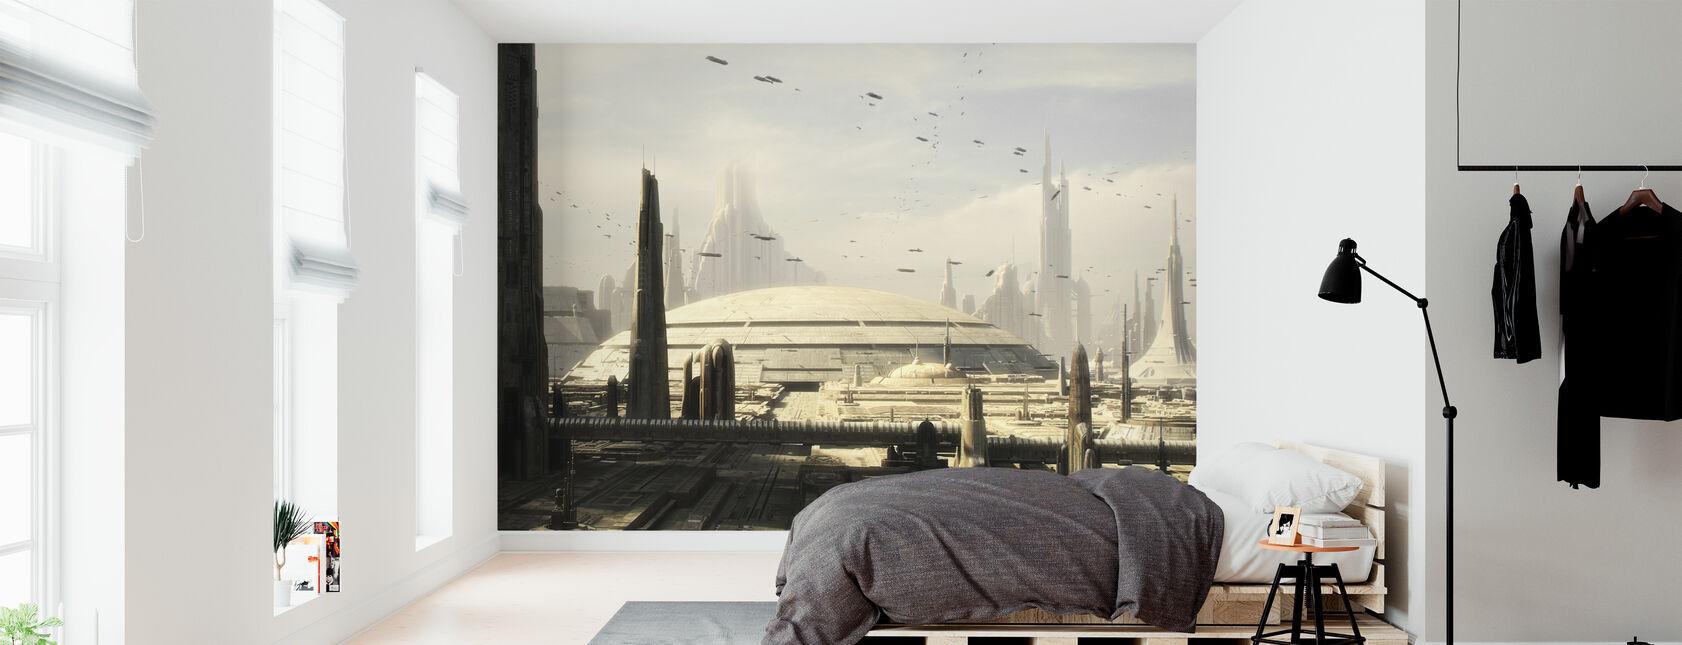 Stjärnornas krig - Koruscant Byggnader 1 - Tapet - Sovrum